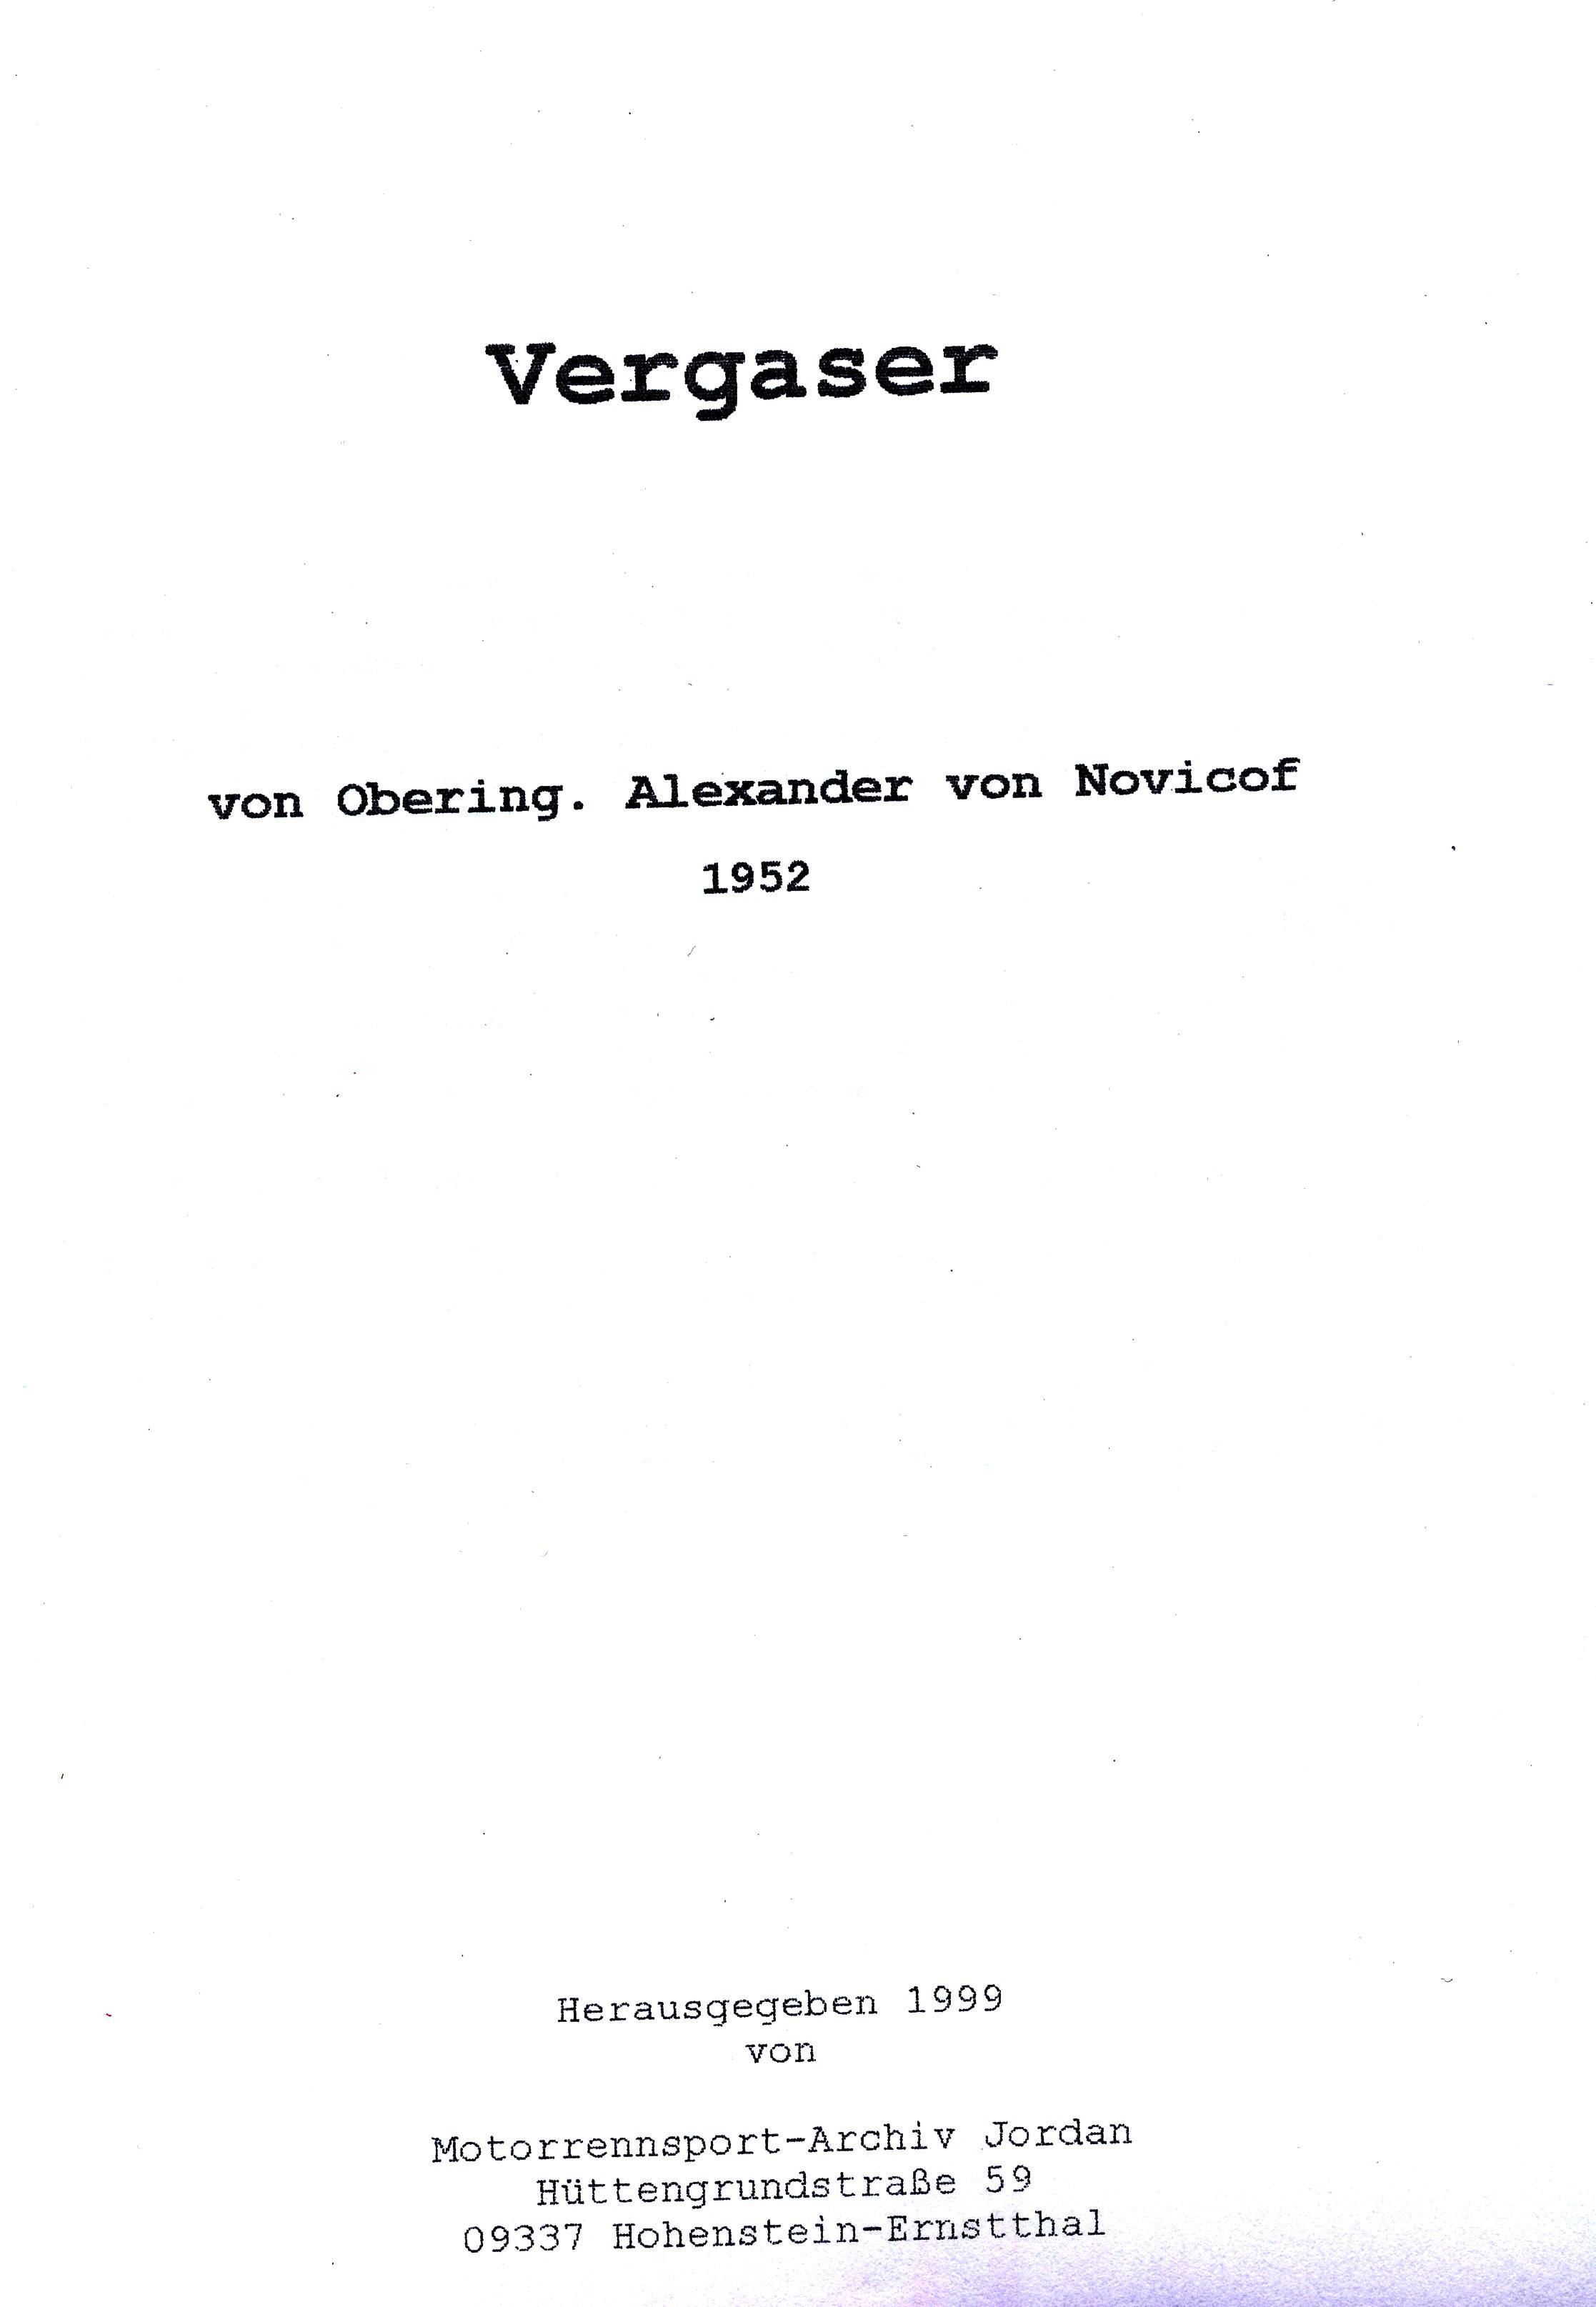 Vergaser-Manuskript